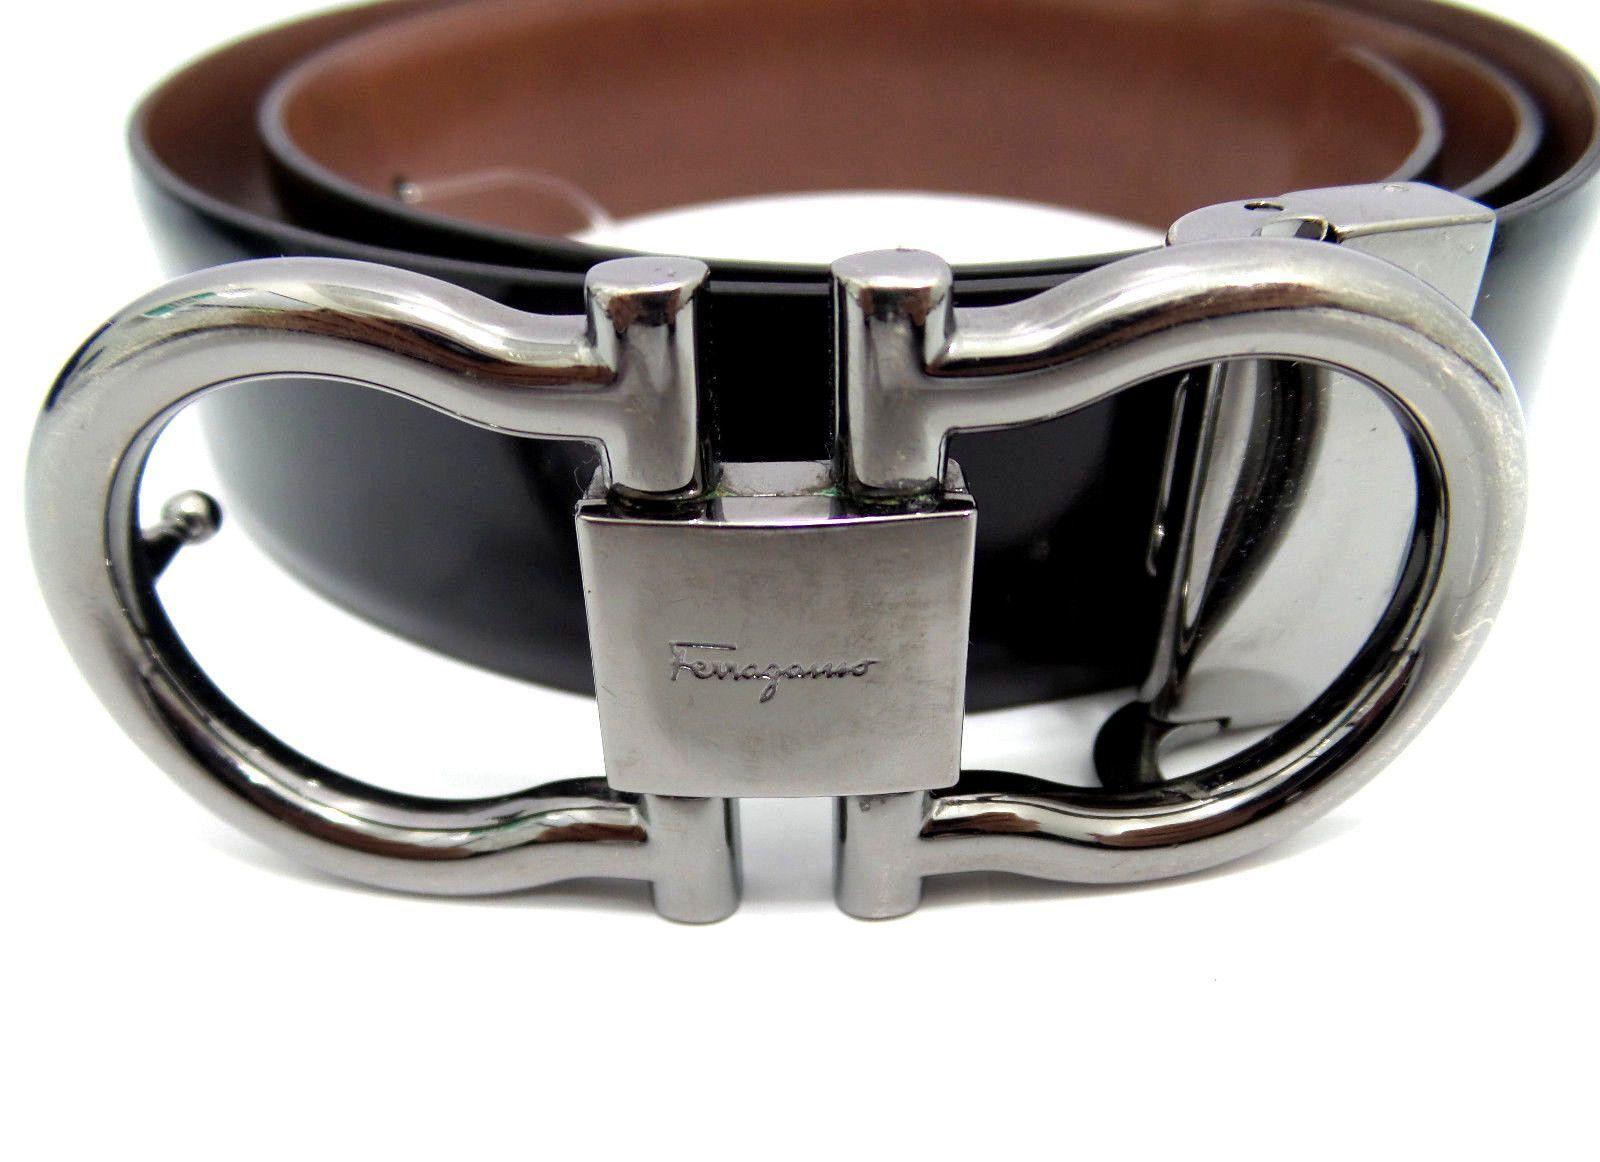 belts for men designer zbit  Salvatore Ferragamo Belt Men's Pre-owned Gancini Reversible Black &  Hickory Leather Silver Buckle 路 Designer BeltsSalvatore Ferragamo